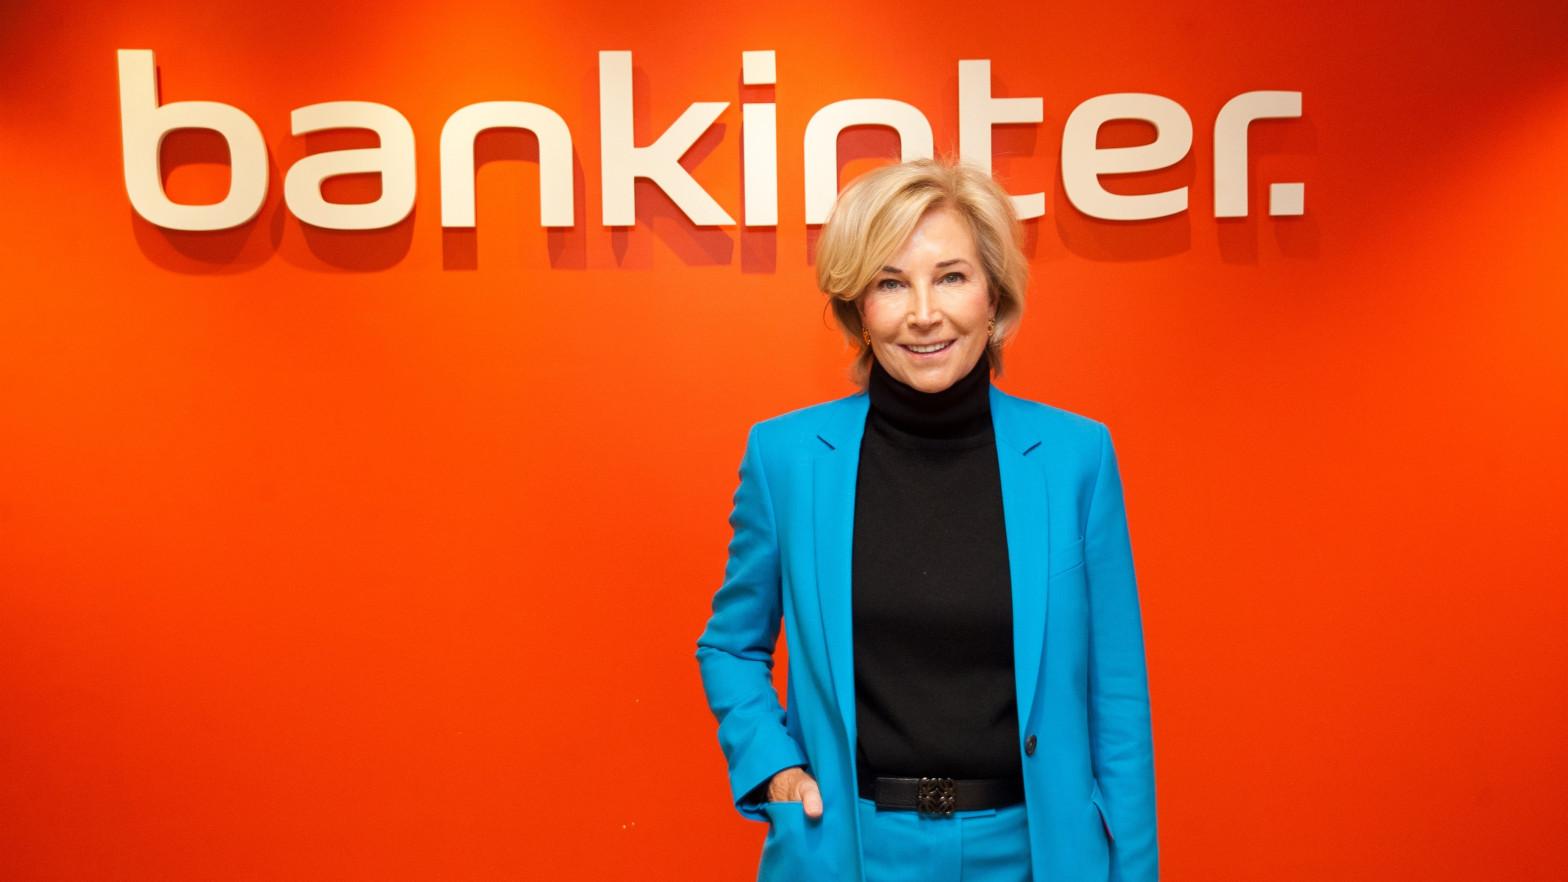 Dancausa ganó 1,23 millones en 2020 como consejera delegada de Bankinter, un 13% menos